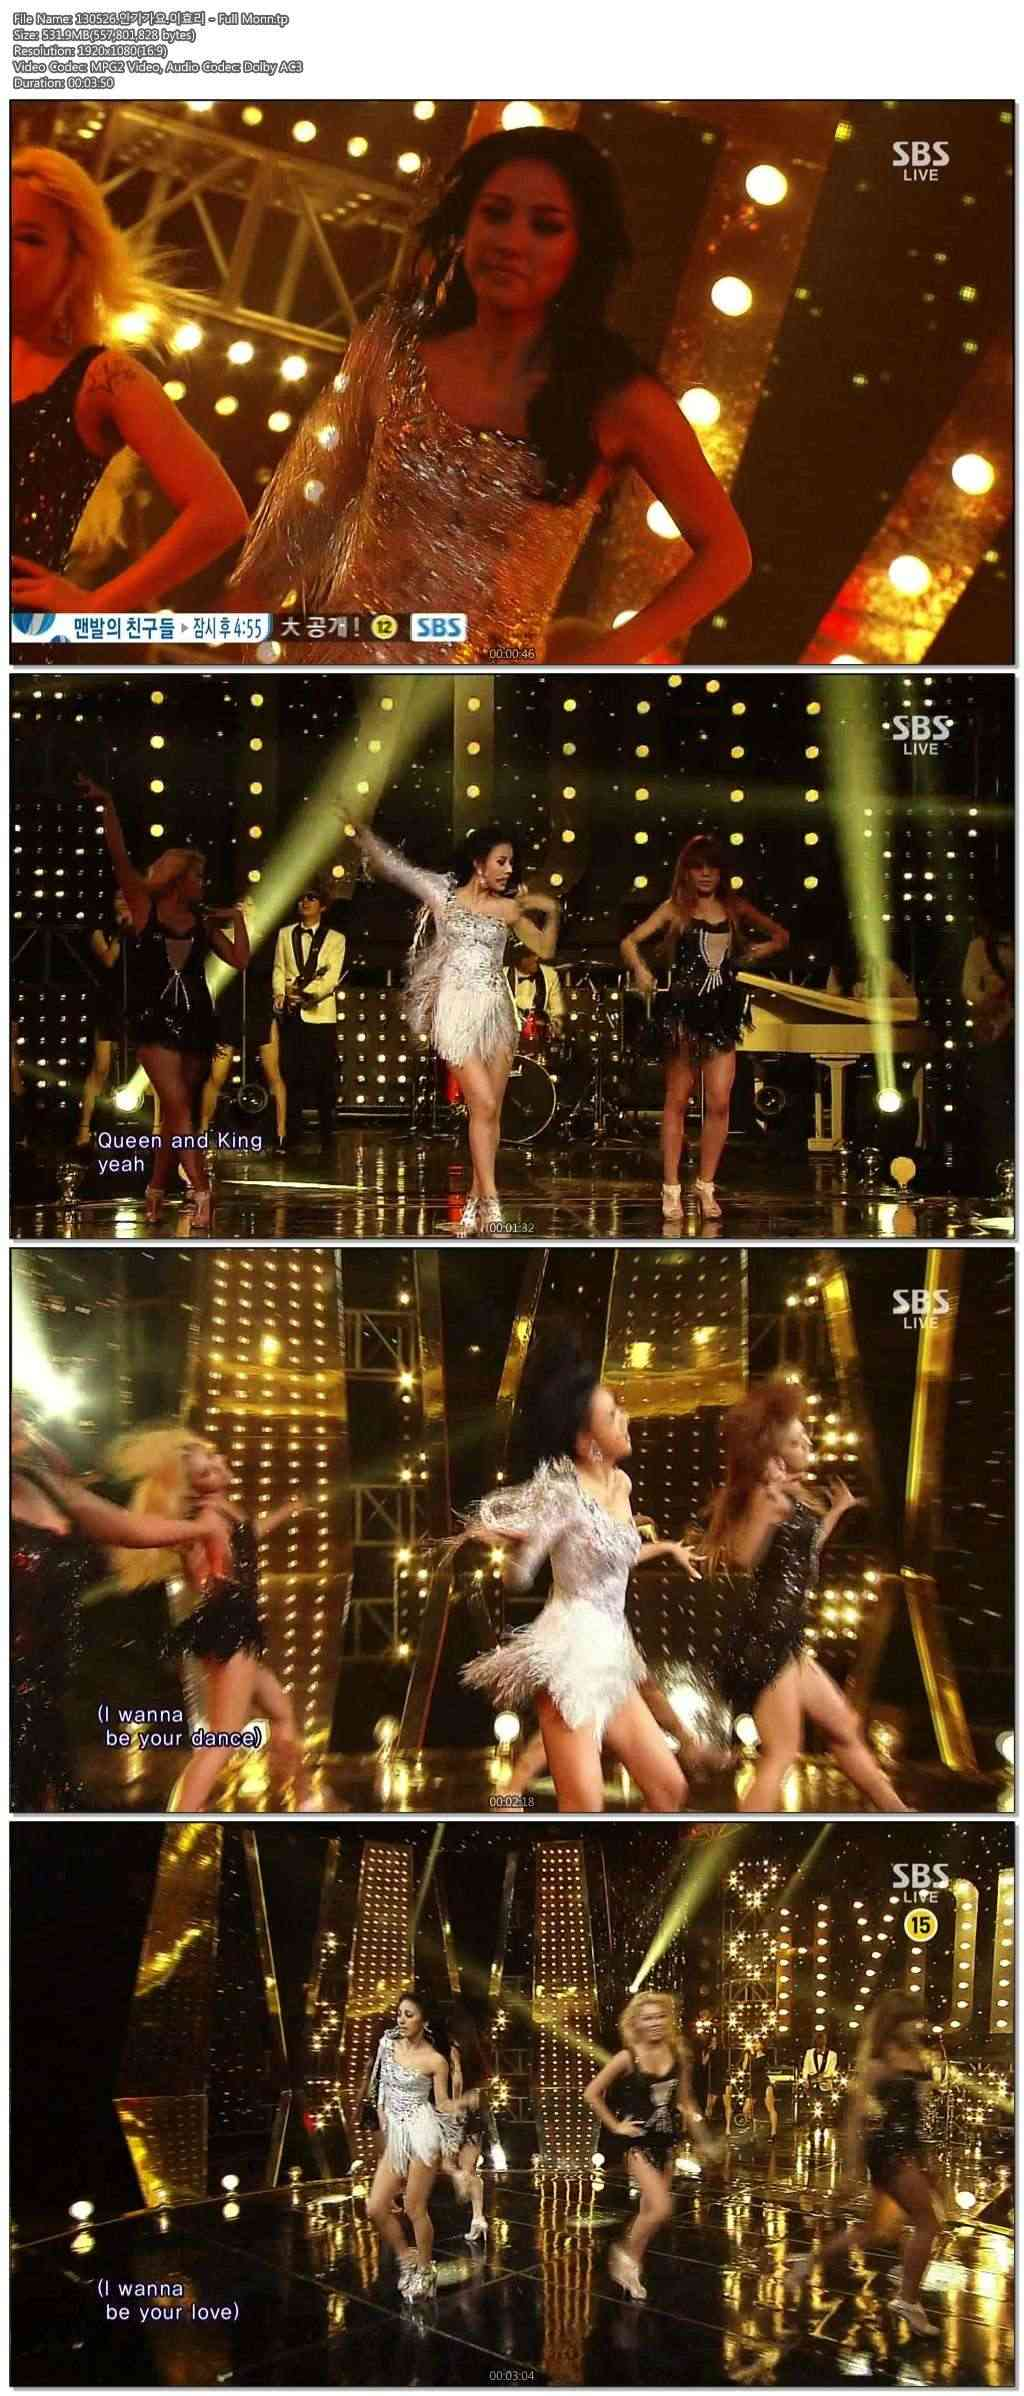 [130526] Hyori - Bad Girls, Interview, Full Moon & Ending @ SBS Inkigayo Zxymnu10